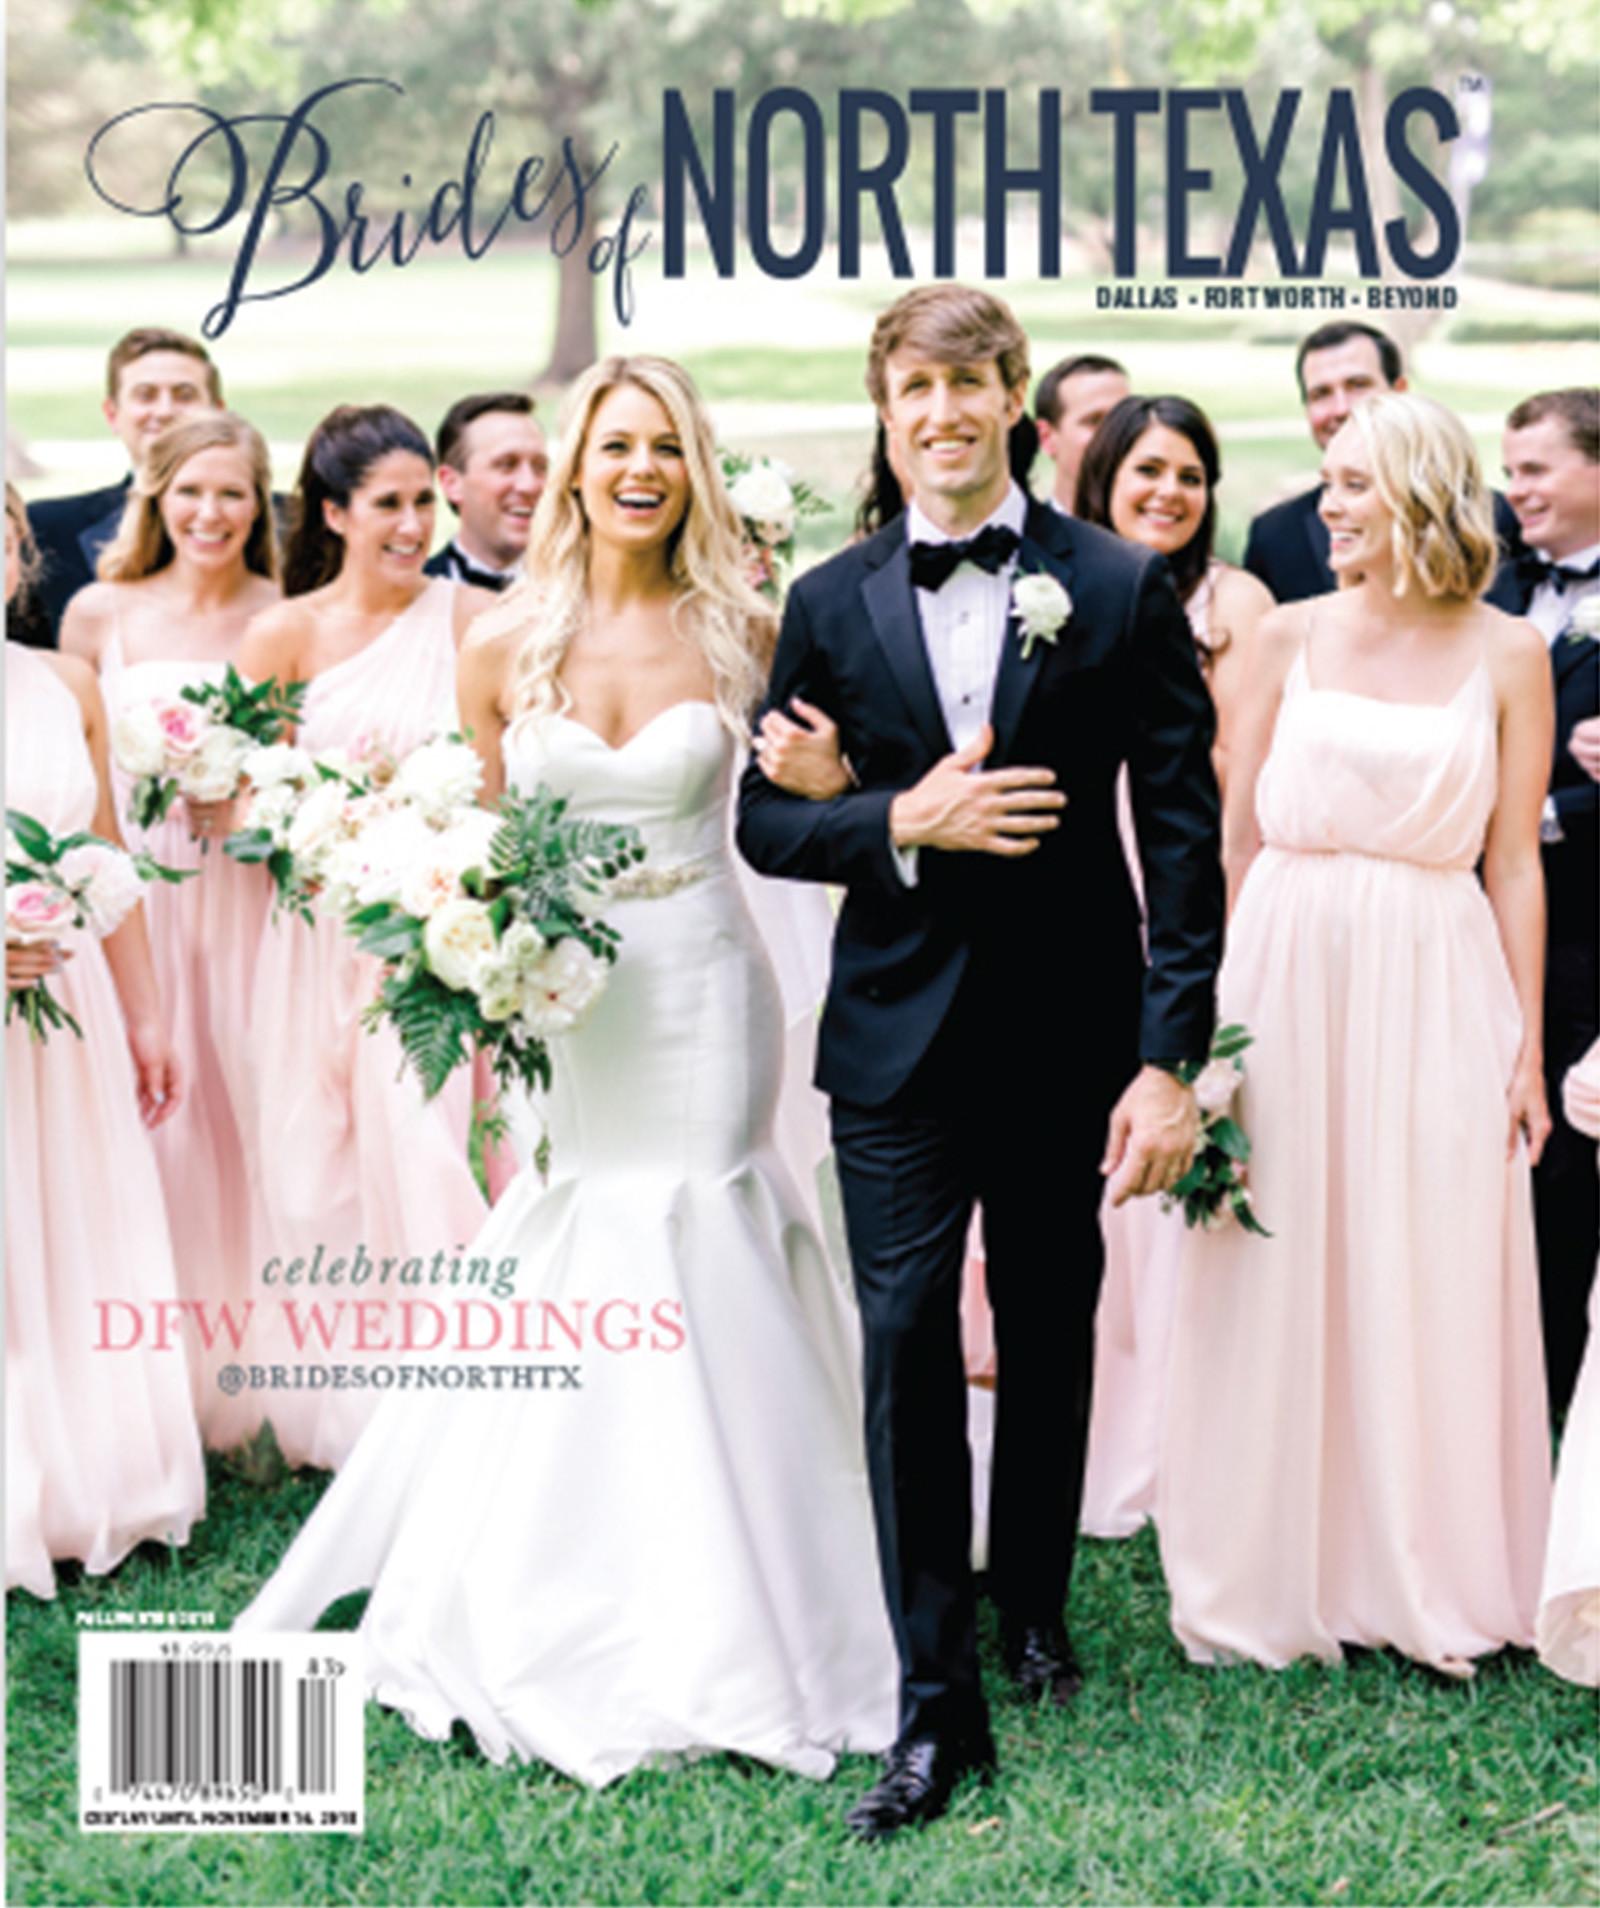 Gaun Pengantin Muslimah Simple Tapi Elegan Luxury Real Weddings Featured In Brides Of north Texas